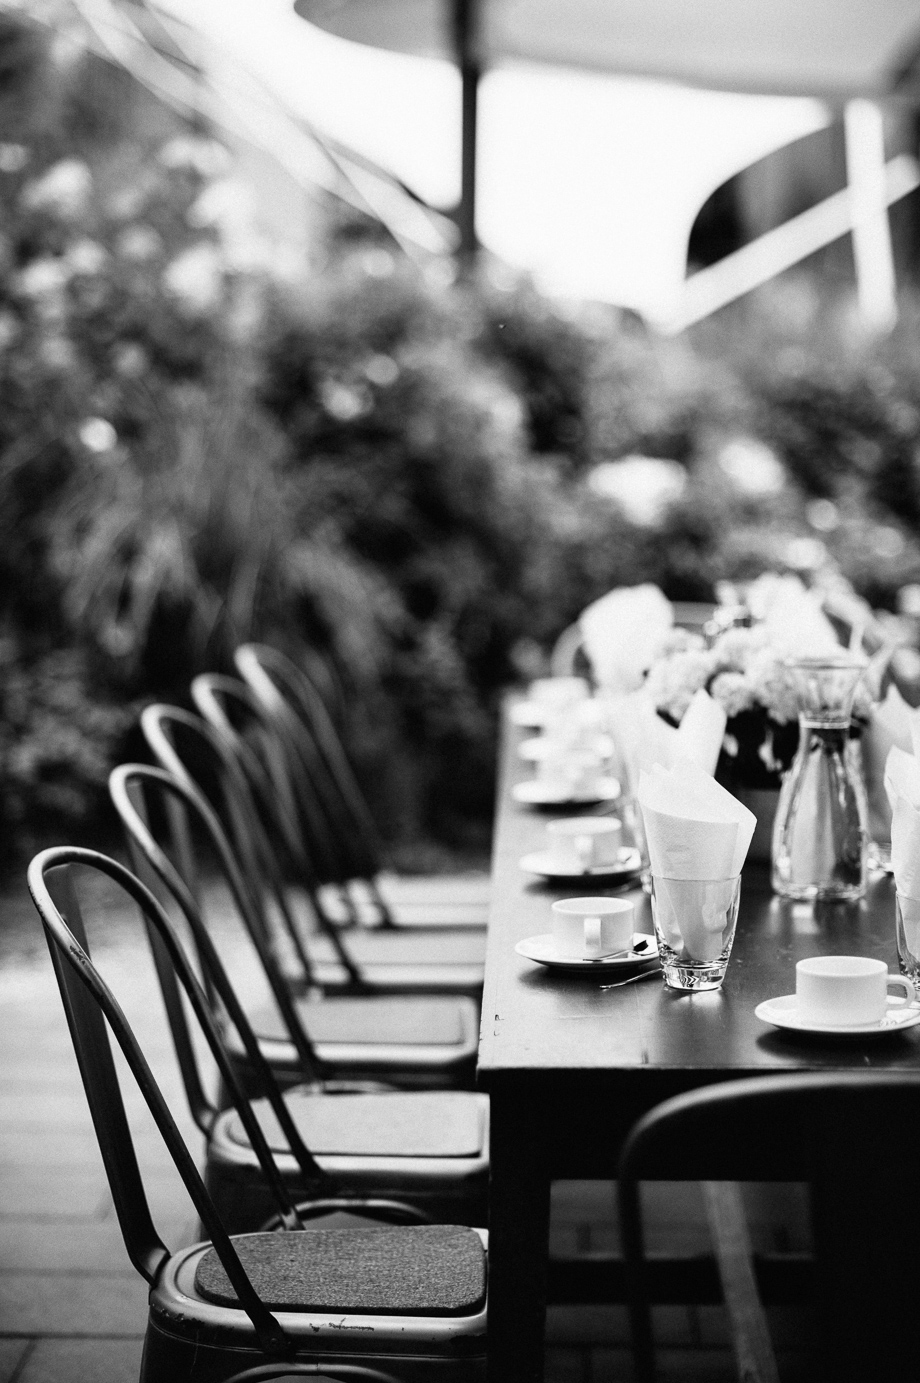 Hochzeit_Kolbermoor_Alte_Spinnerei_Modern_Brautpaar_Multikulturell_Laura_Elena_Photography_040